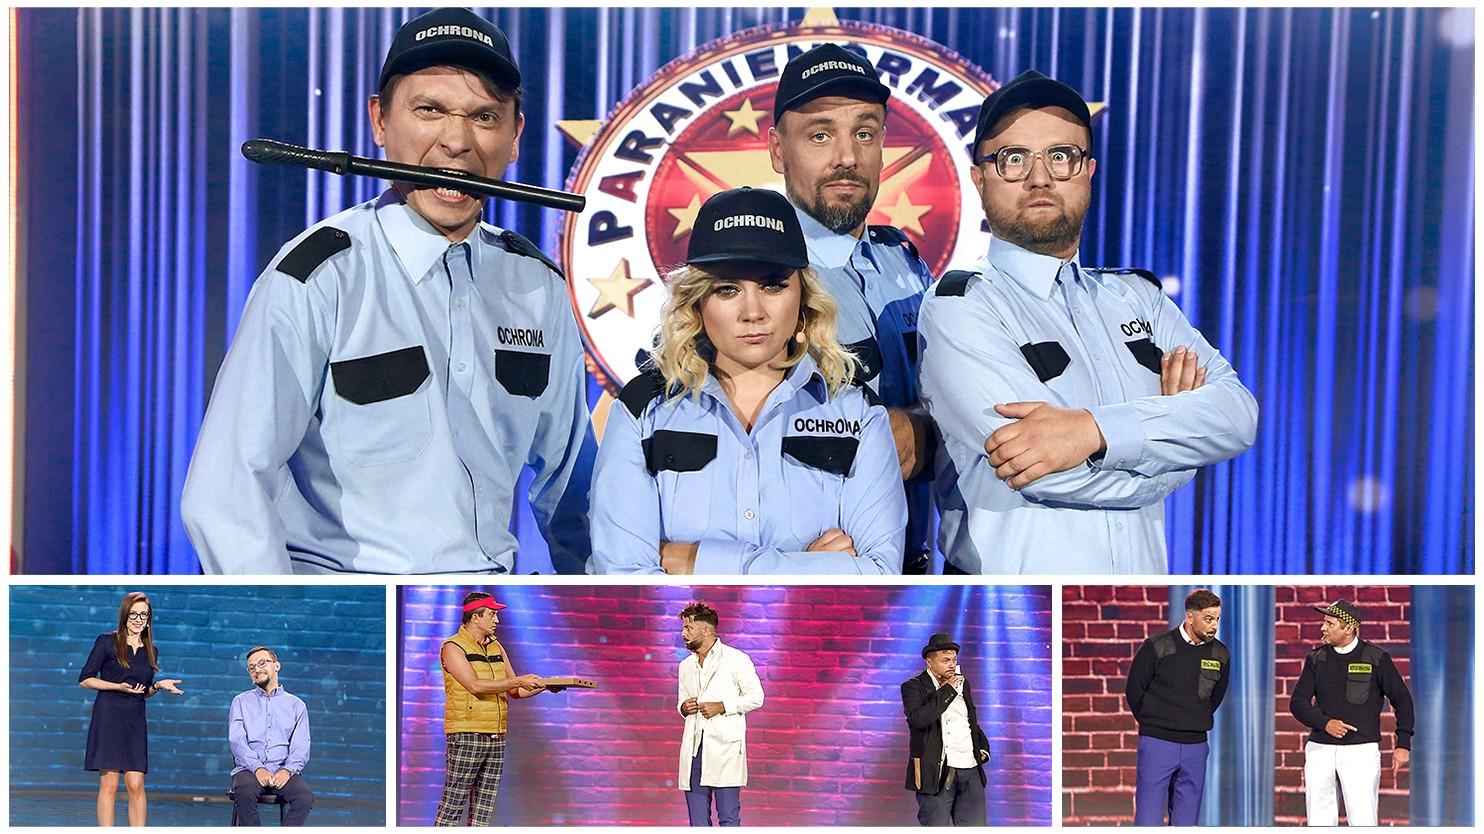 Paranienormalni Show: Napad, ochrona i... miłosny stand-up - Polsat.pl